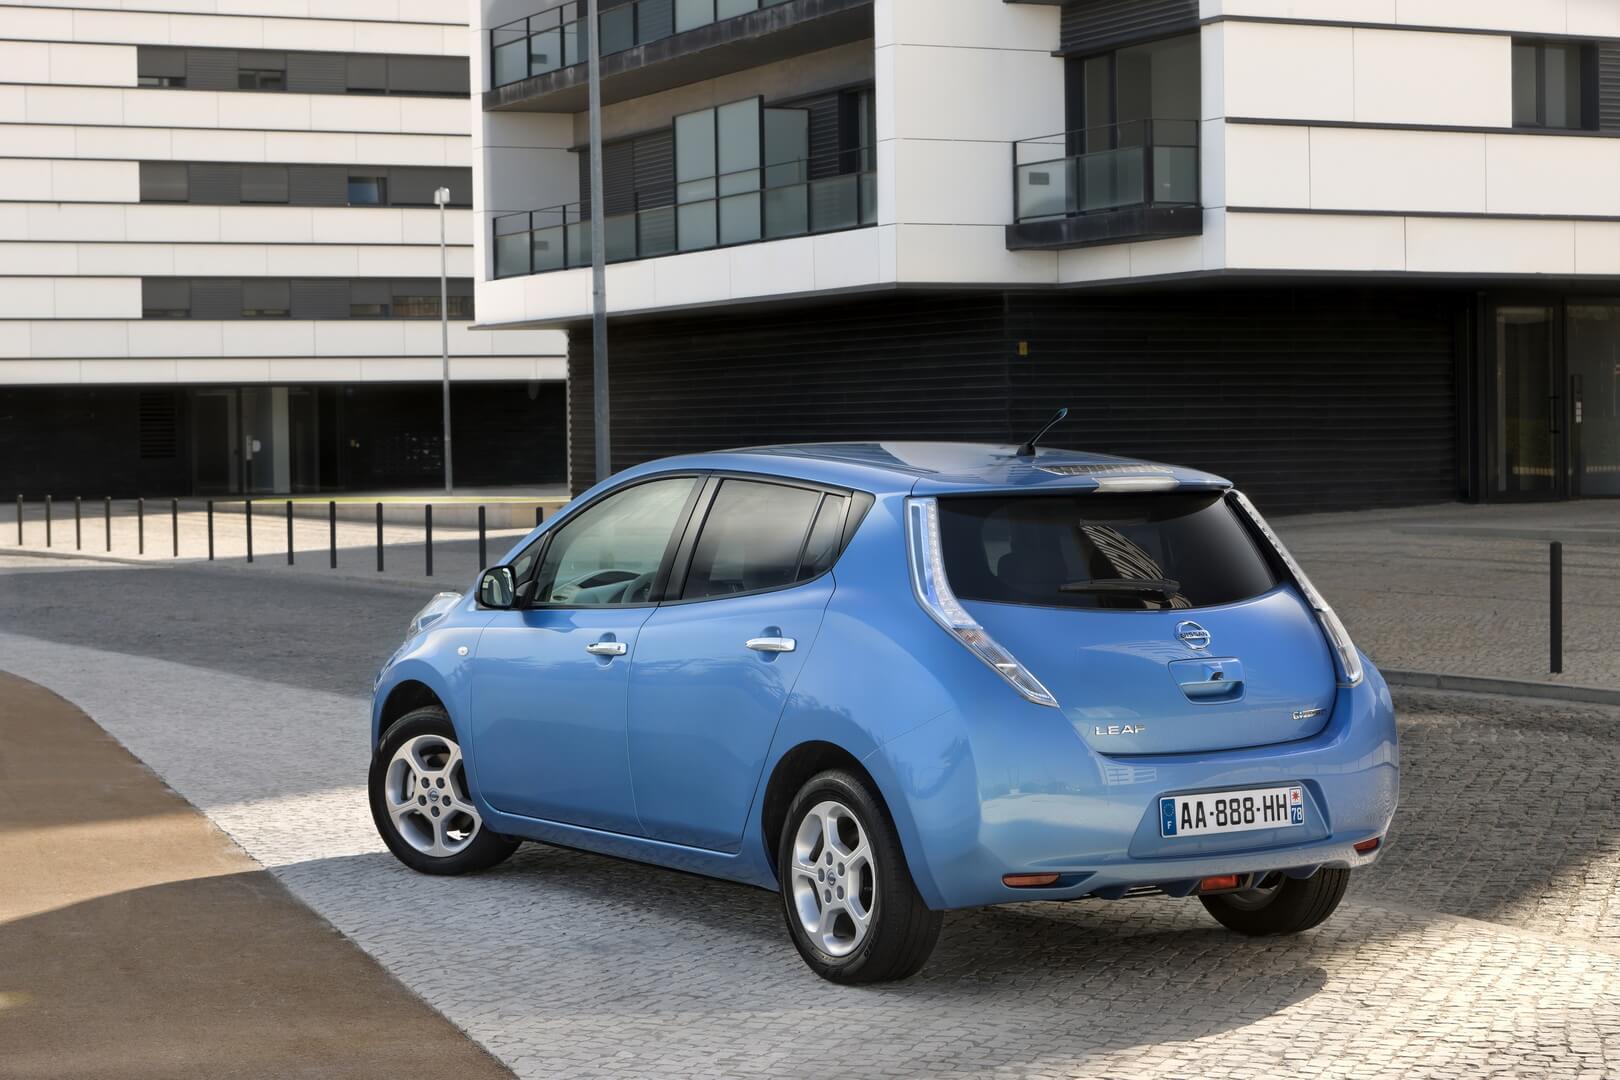 Фотография экоавто Nissan Leaf 2010 (24 кВт•ч) - фото 29